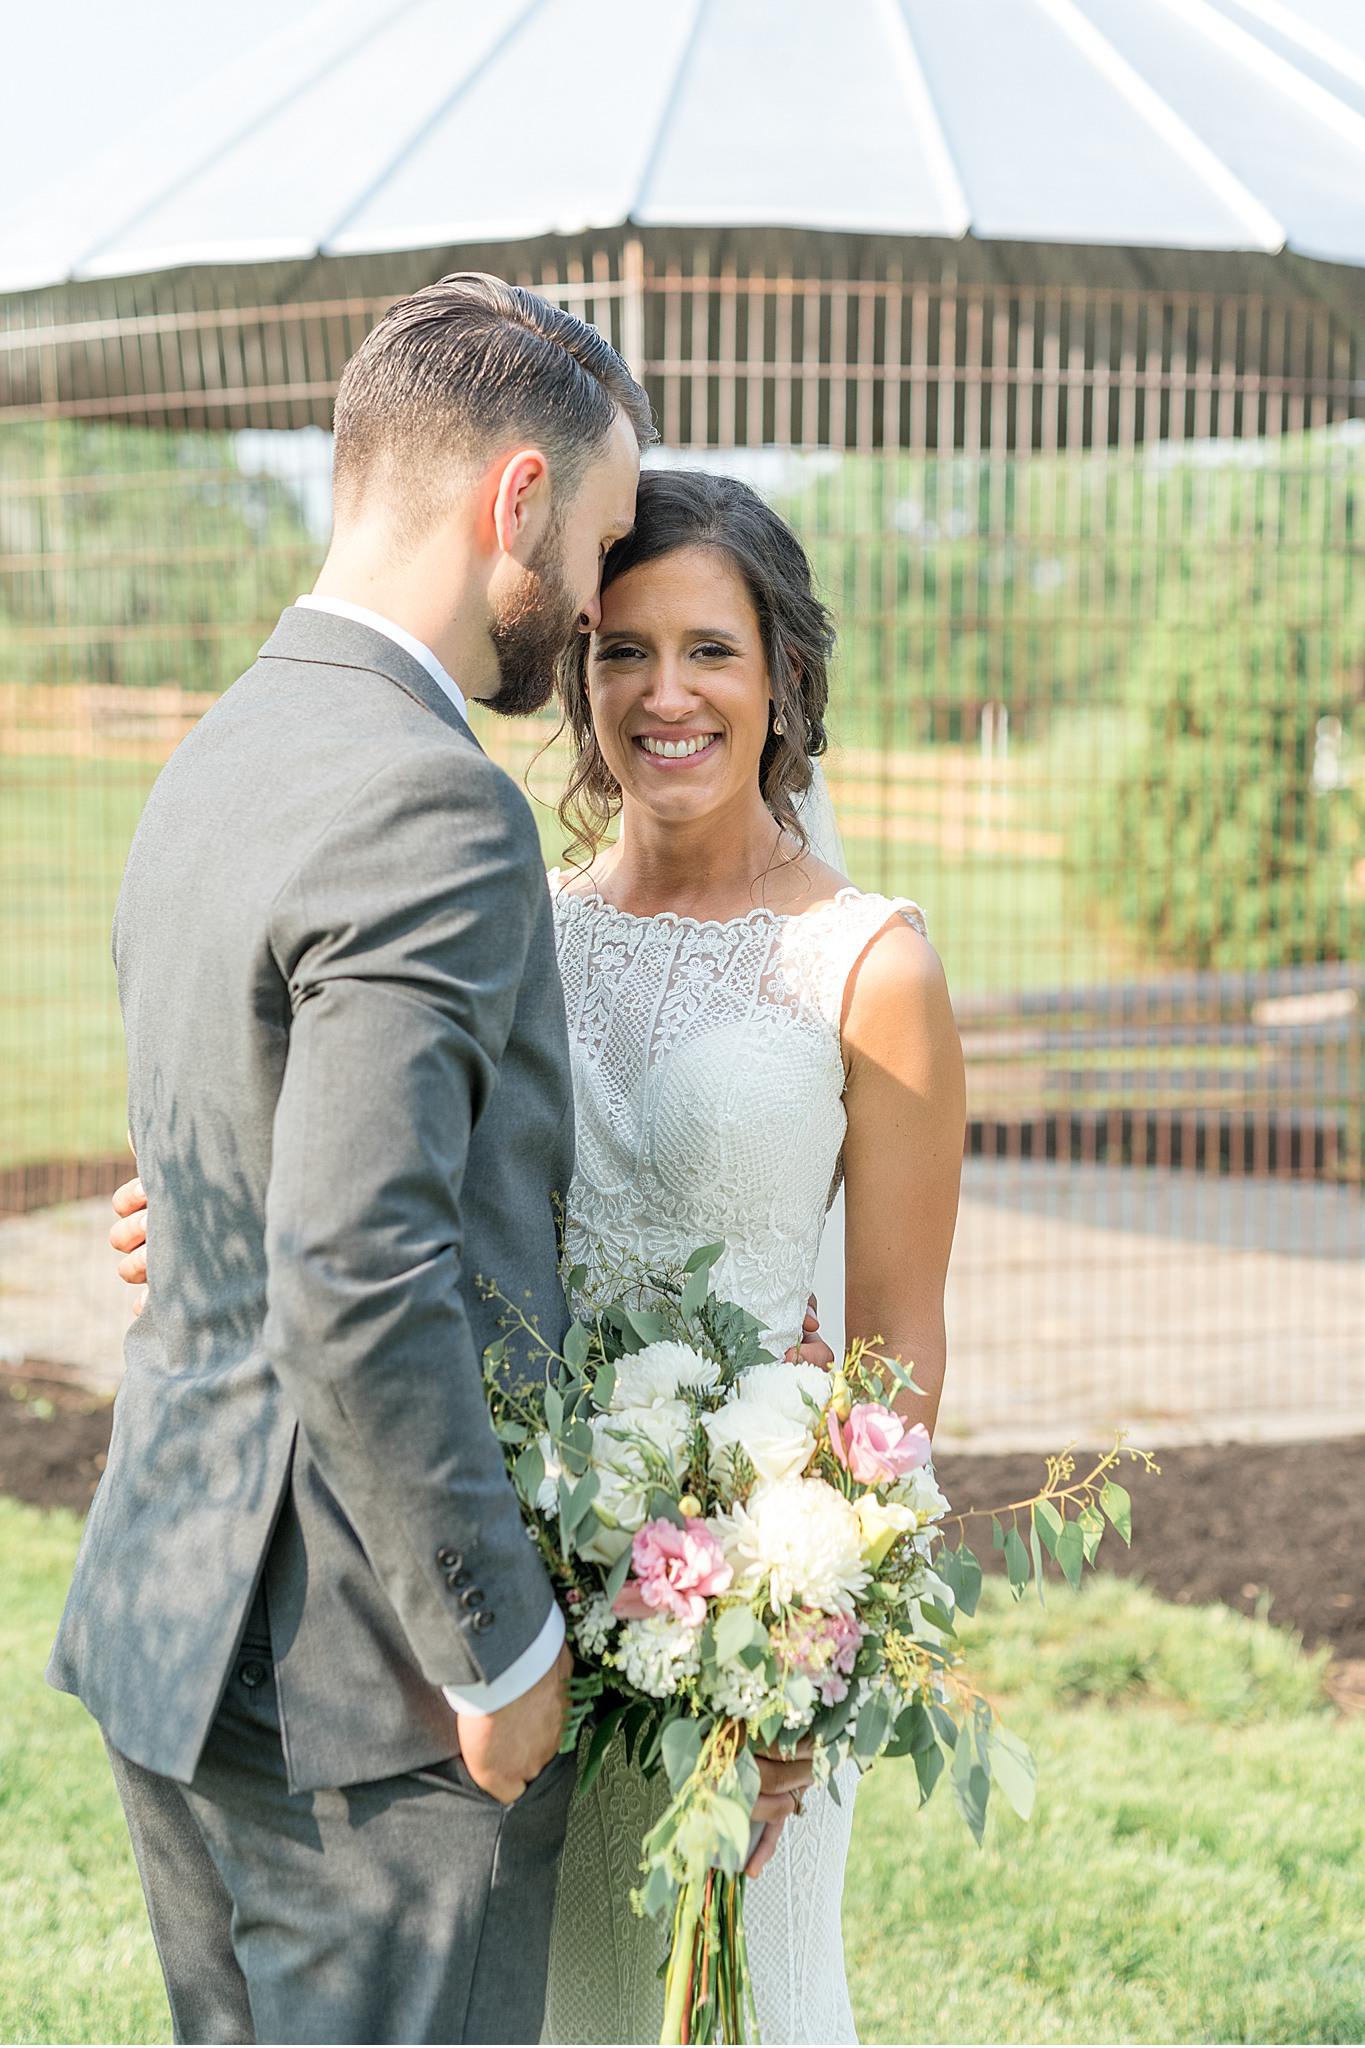 Simmontown wedding Barn Lancaster PA wedding engagement Photography_3633.jpg